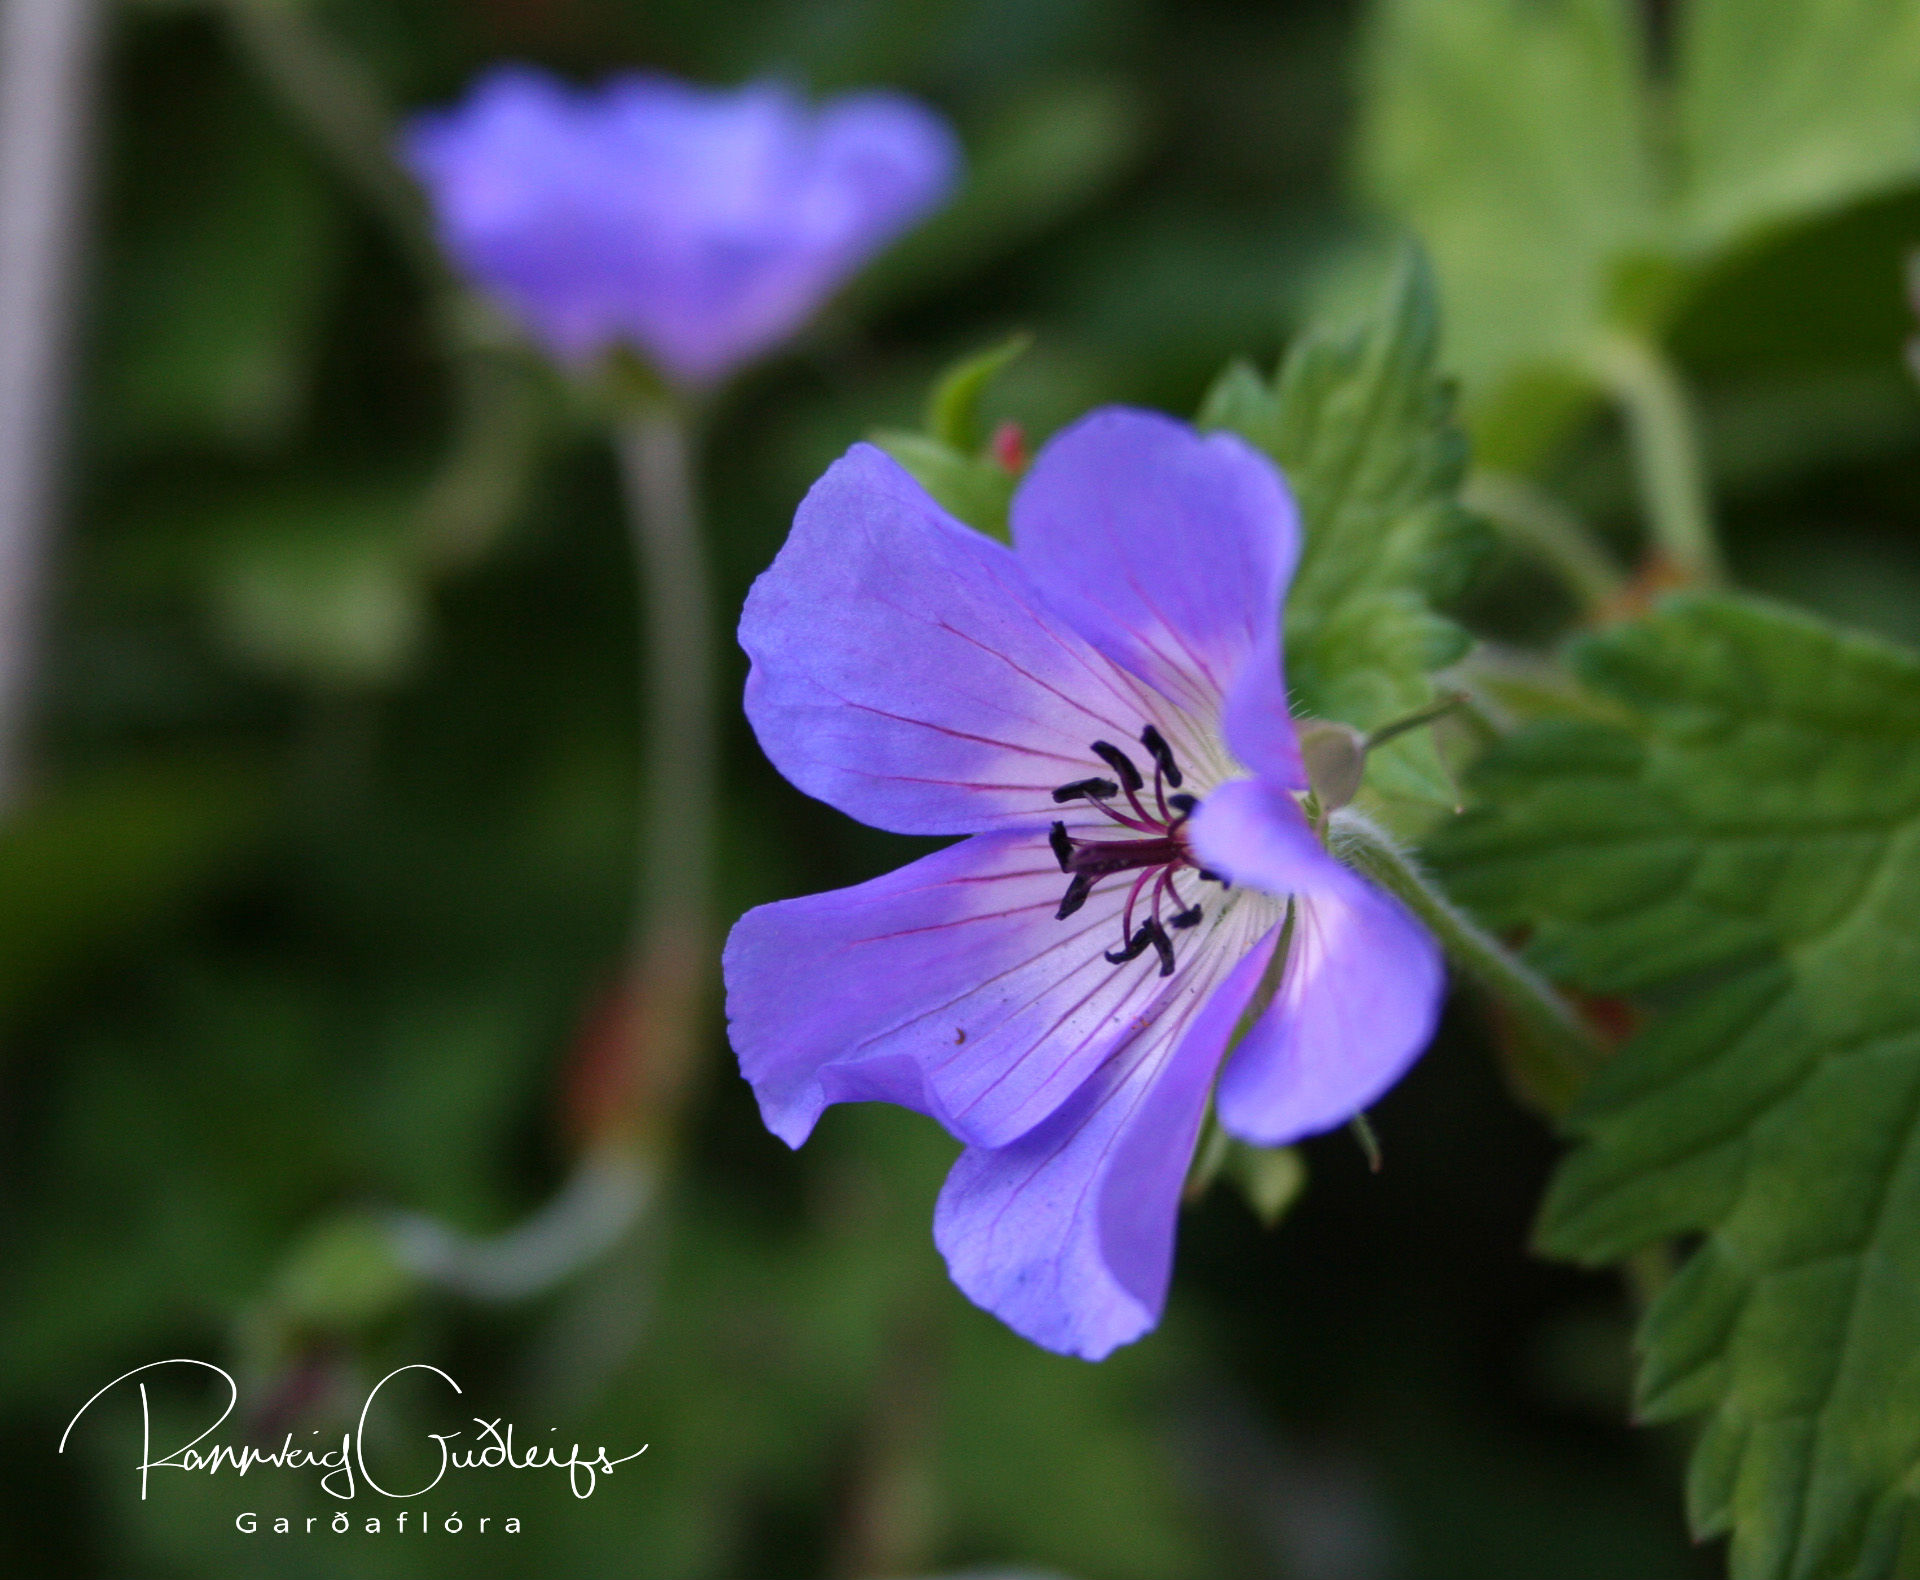 Geranium wallichianum 'Buxtons Blue'